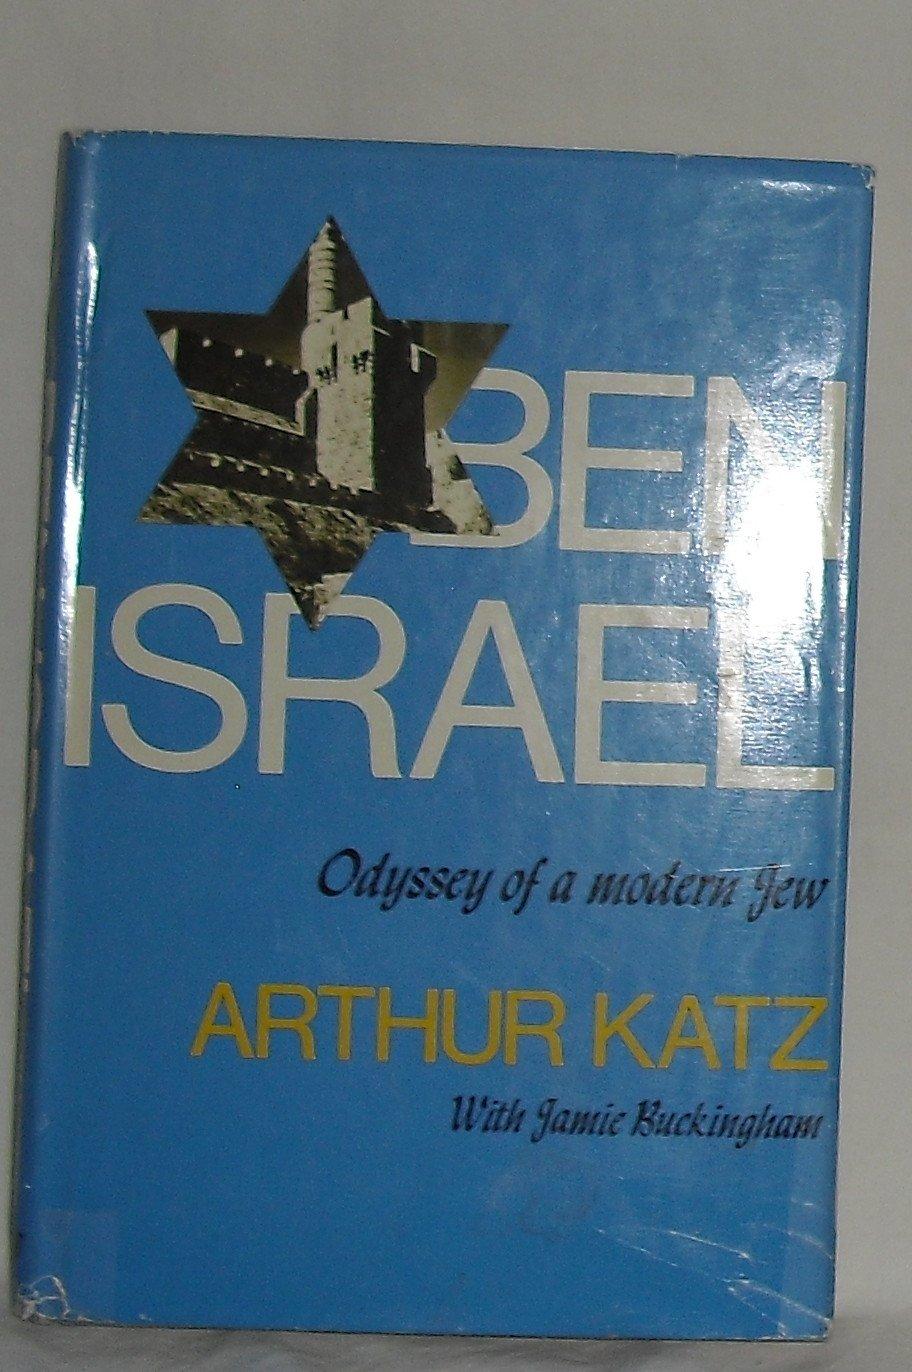 Ben Israel - Odyssey Of A Modern Jew